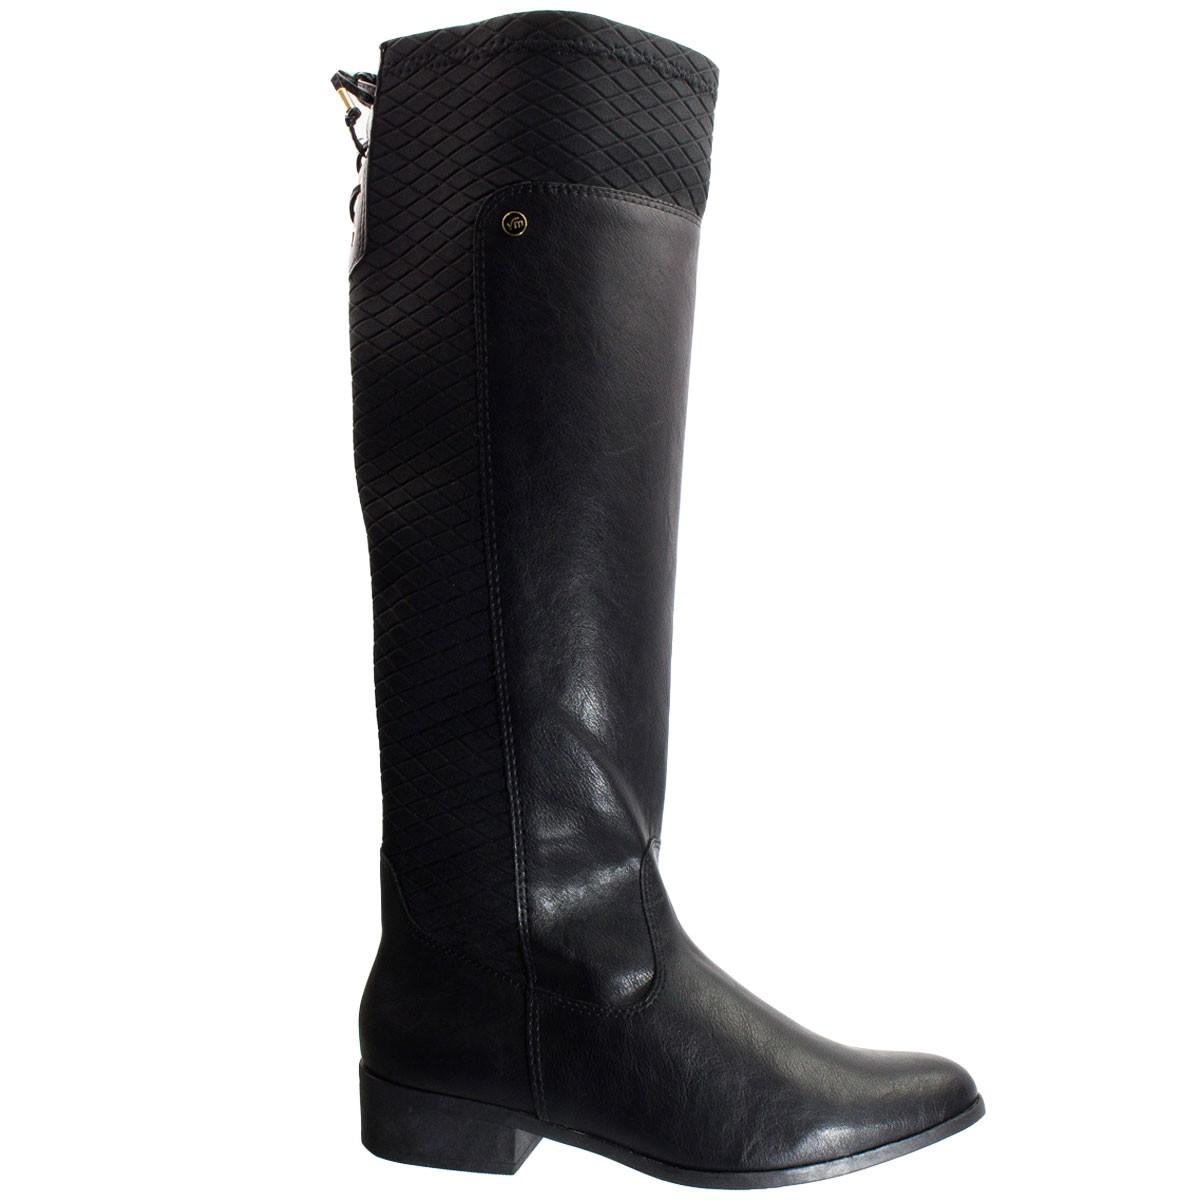 8f757496df Bizz Store - Bota Feminina Via Marte Napa Style Cano Longo